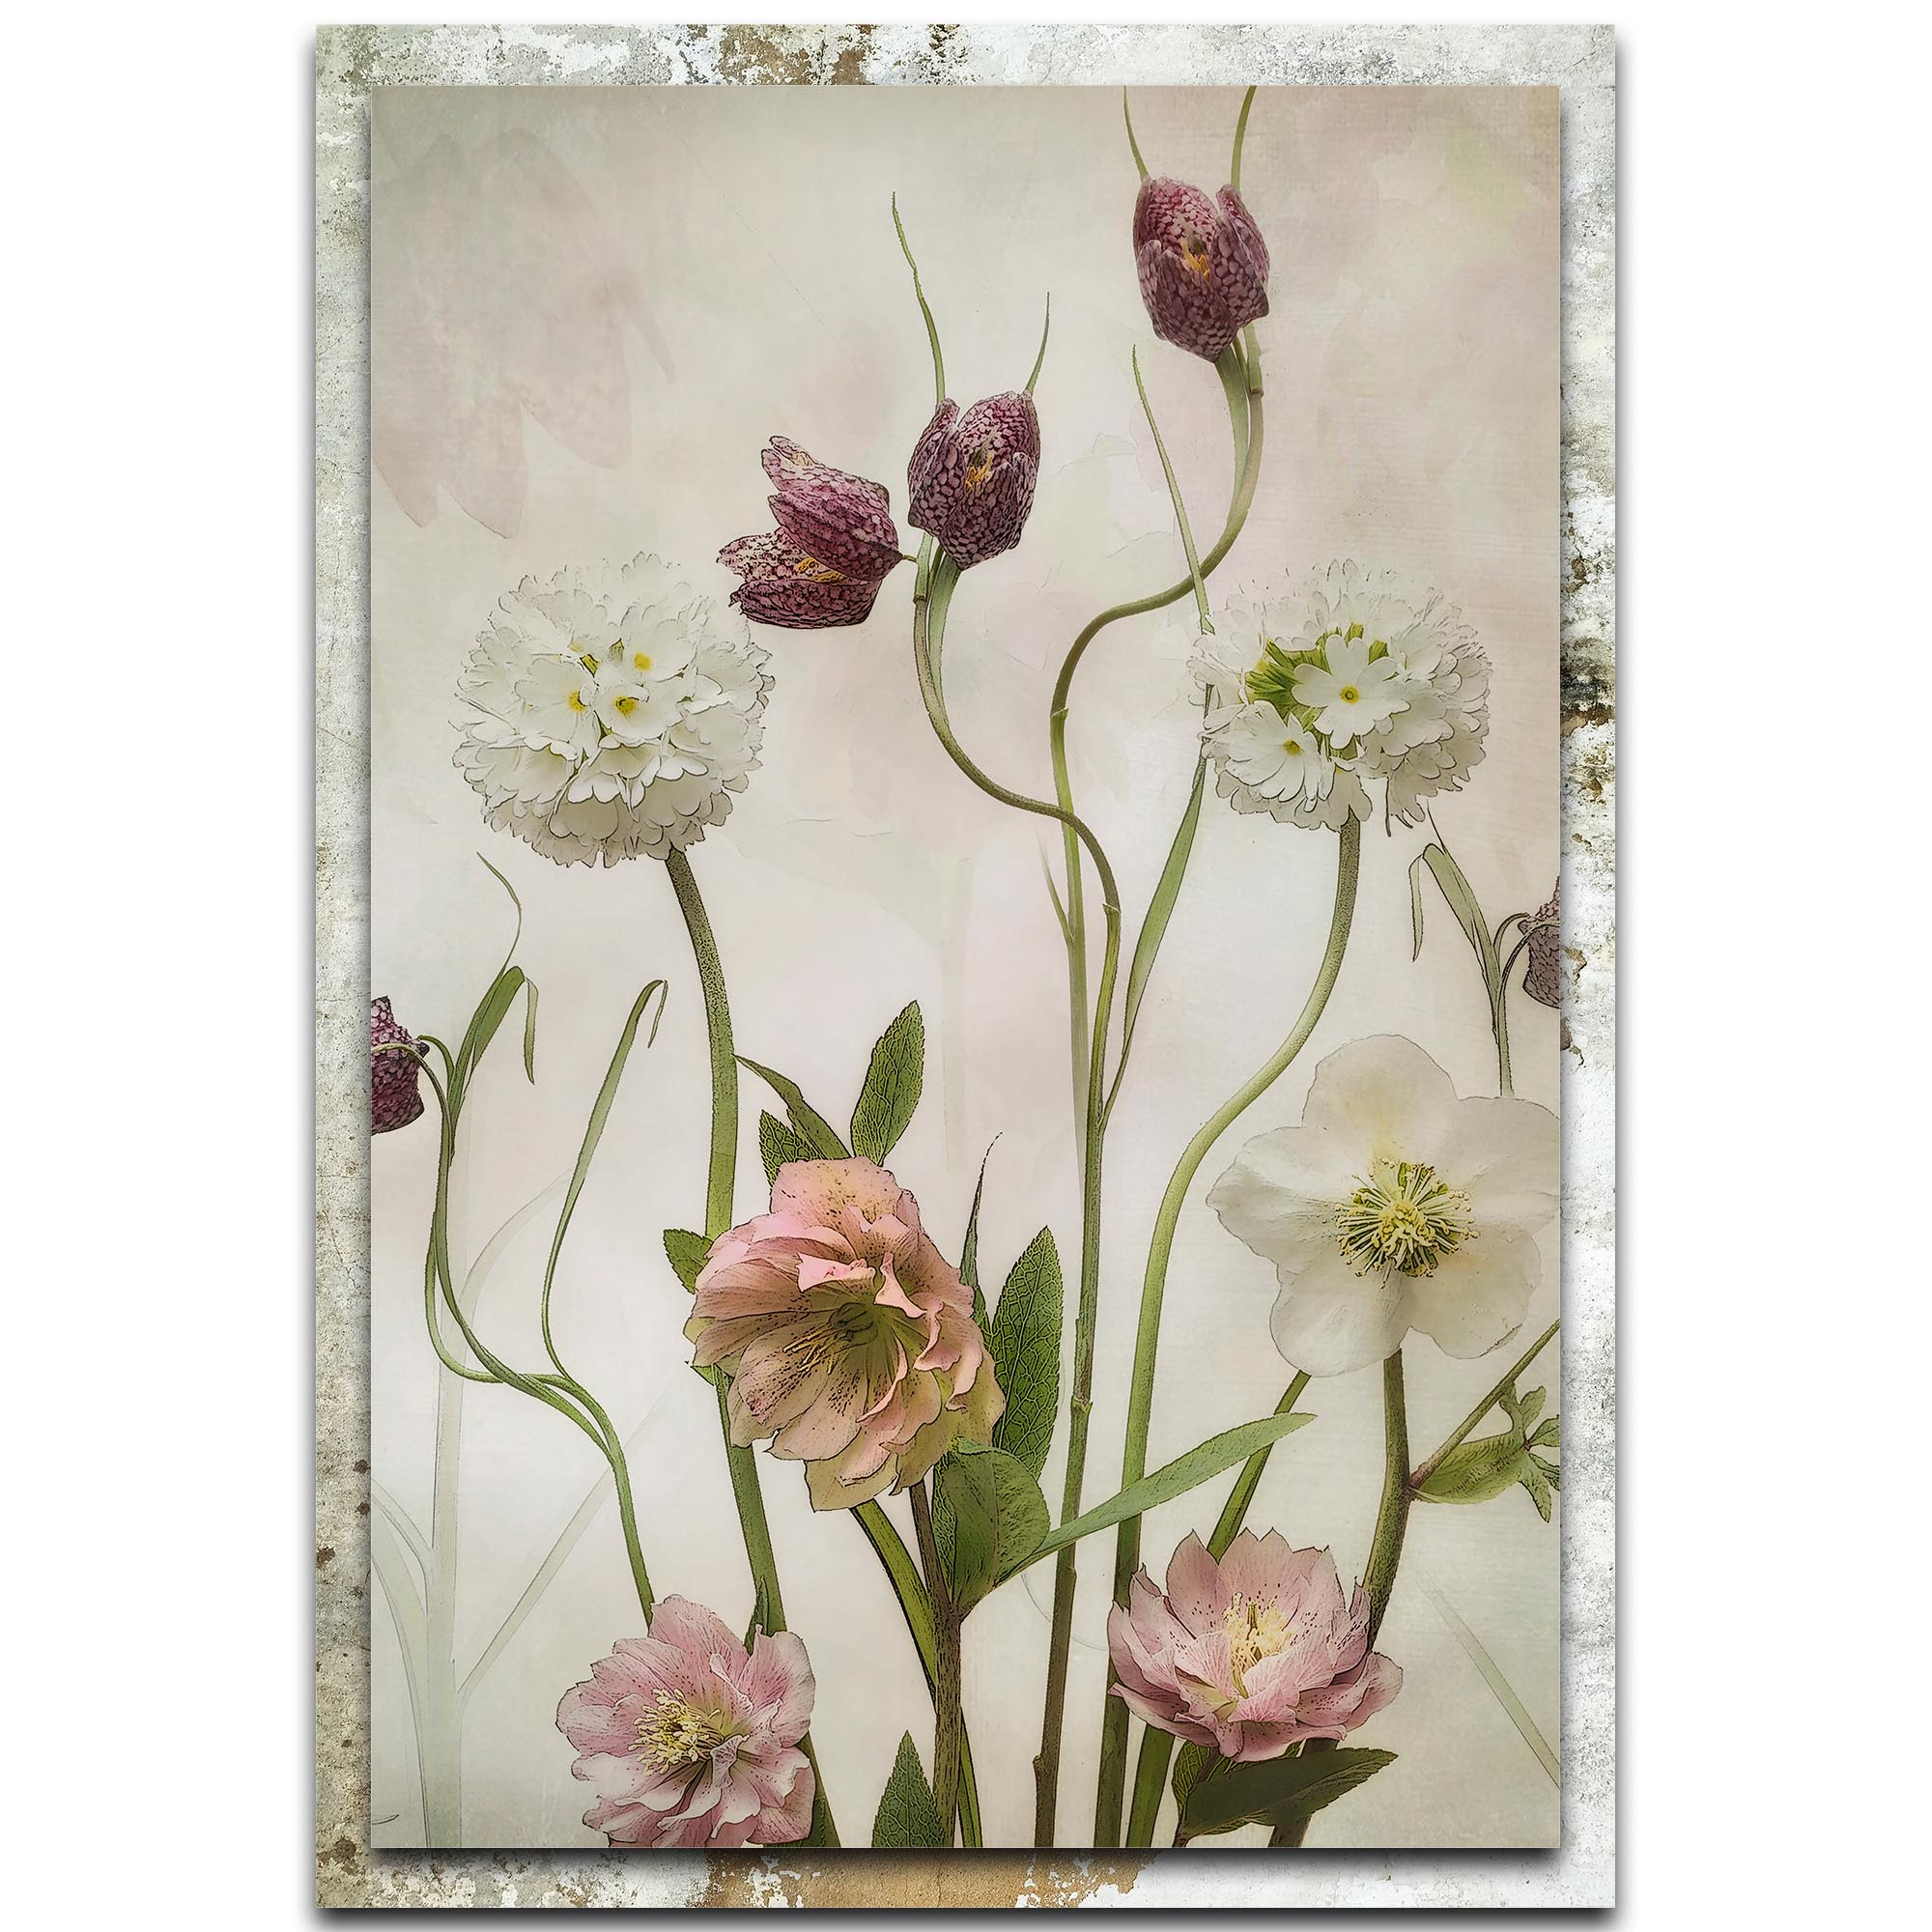 Sharon Williams 'Spring Garden' 22in x 32in Modern Farmhouse Floral on Metal